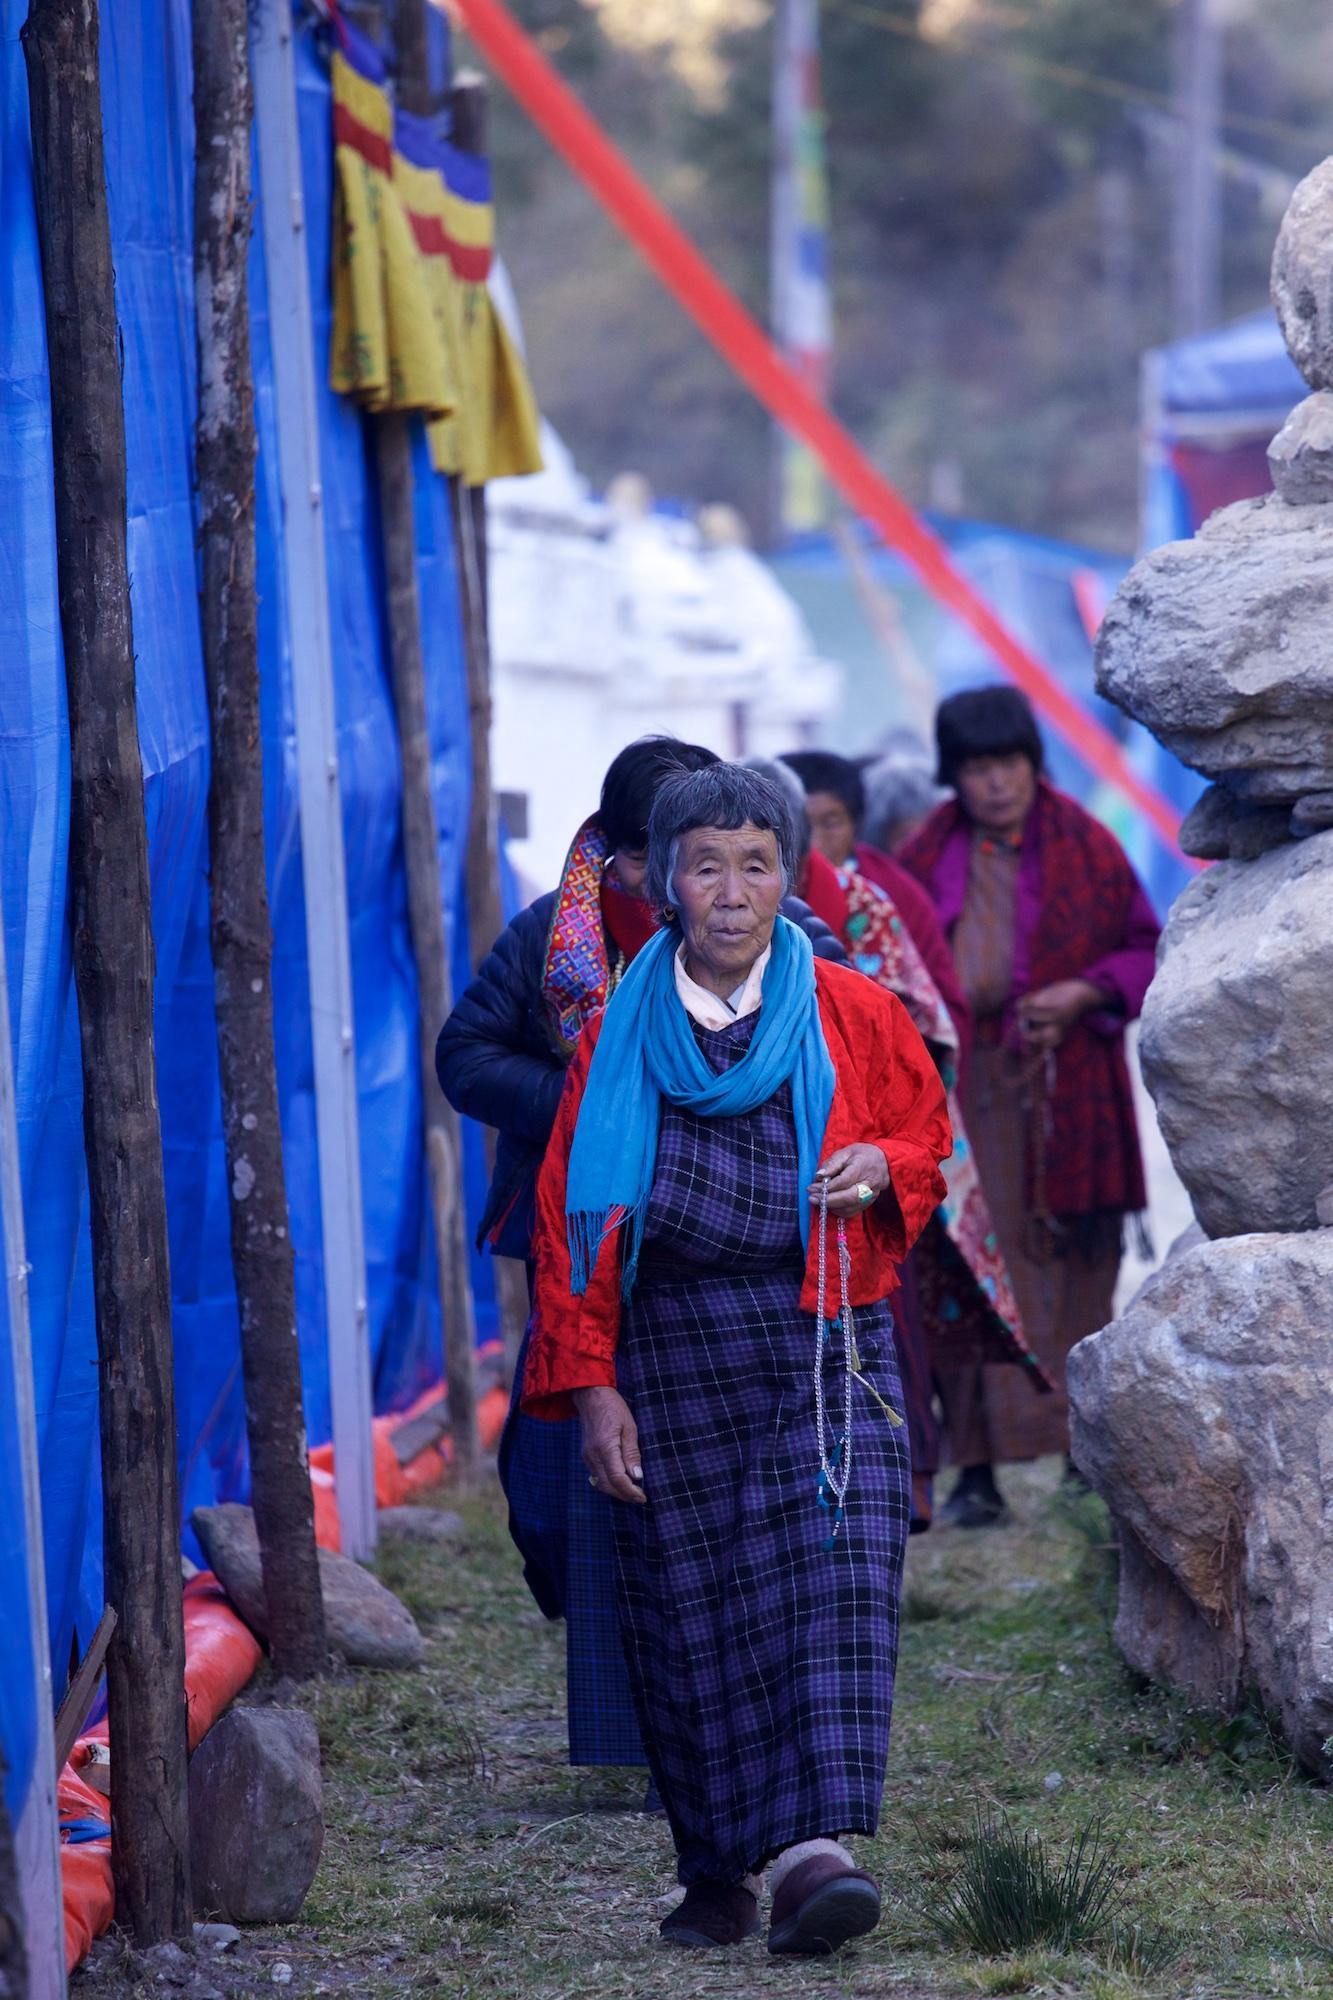 Bhutan-2016- C26O9642.jpg